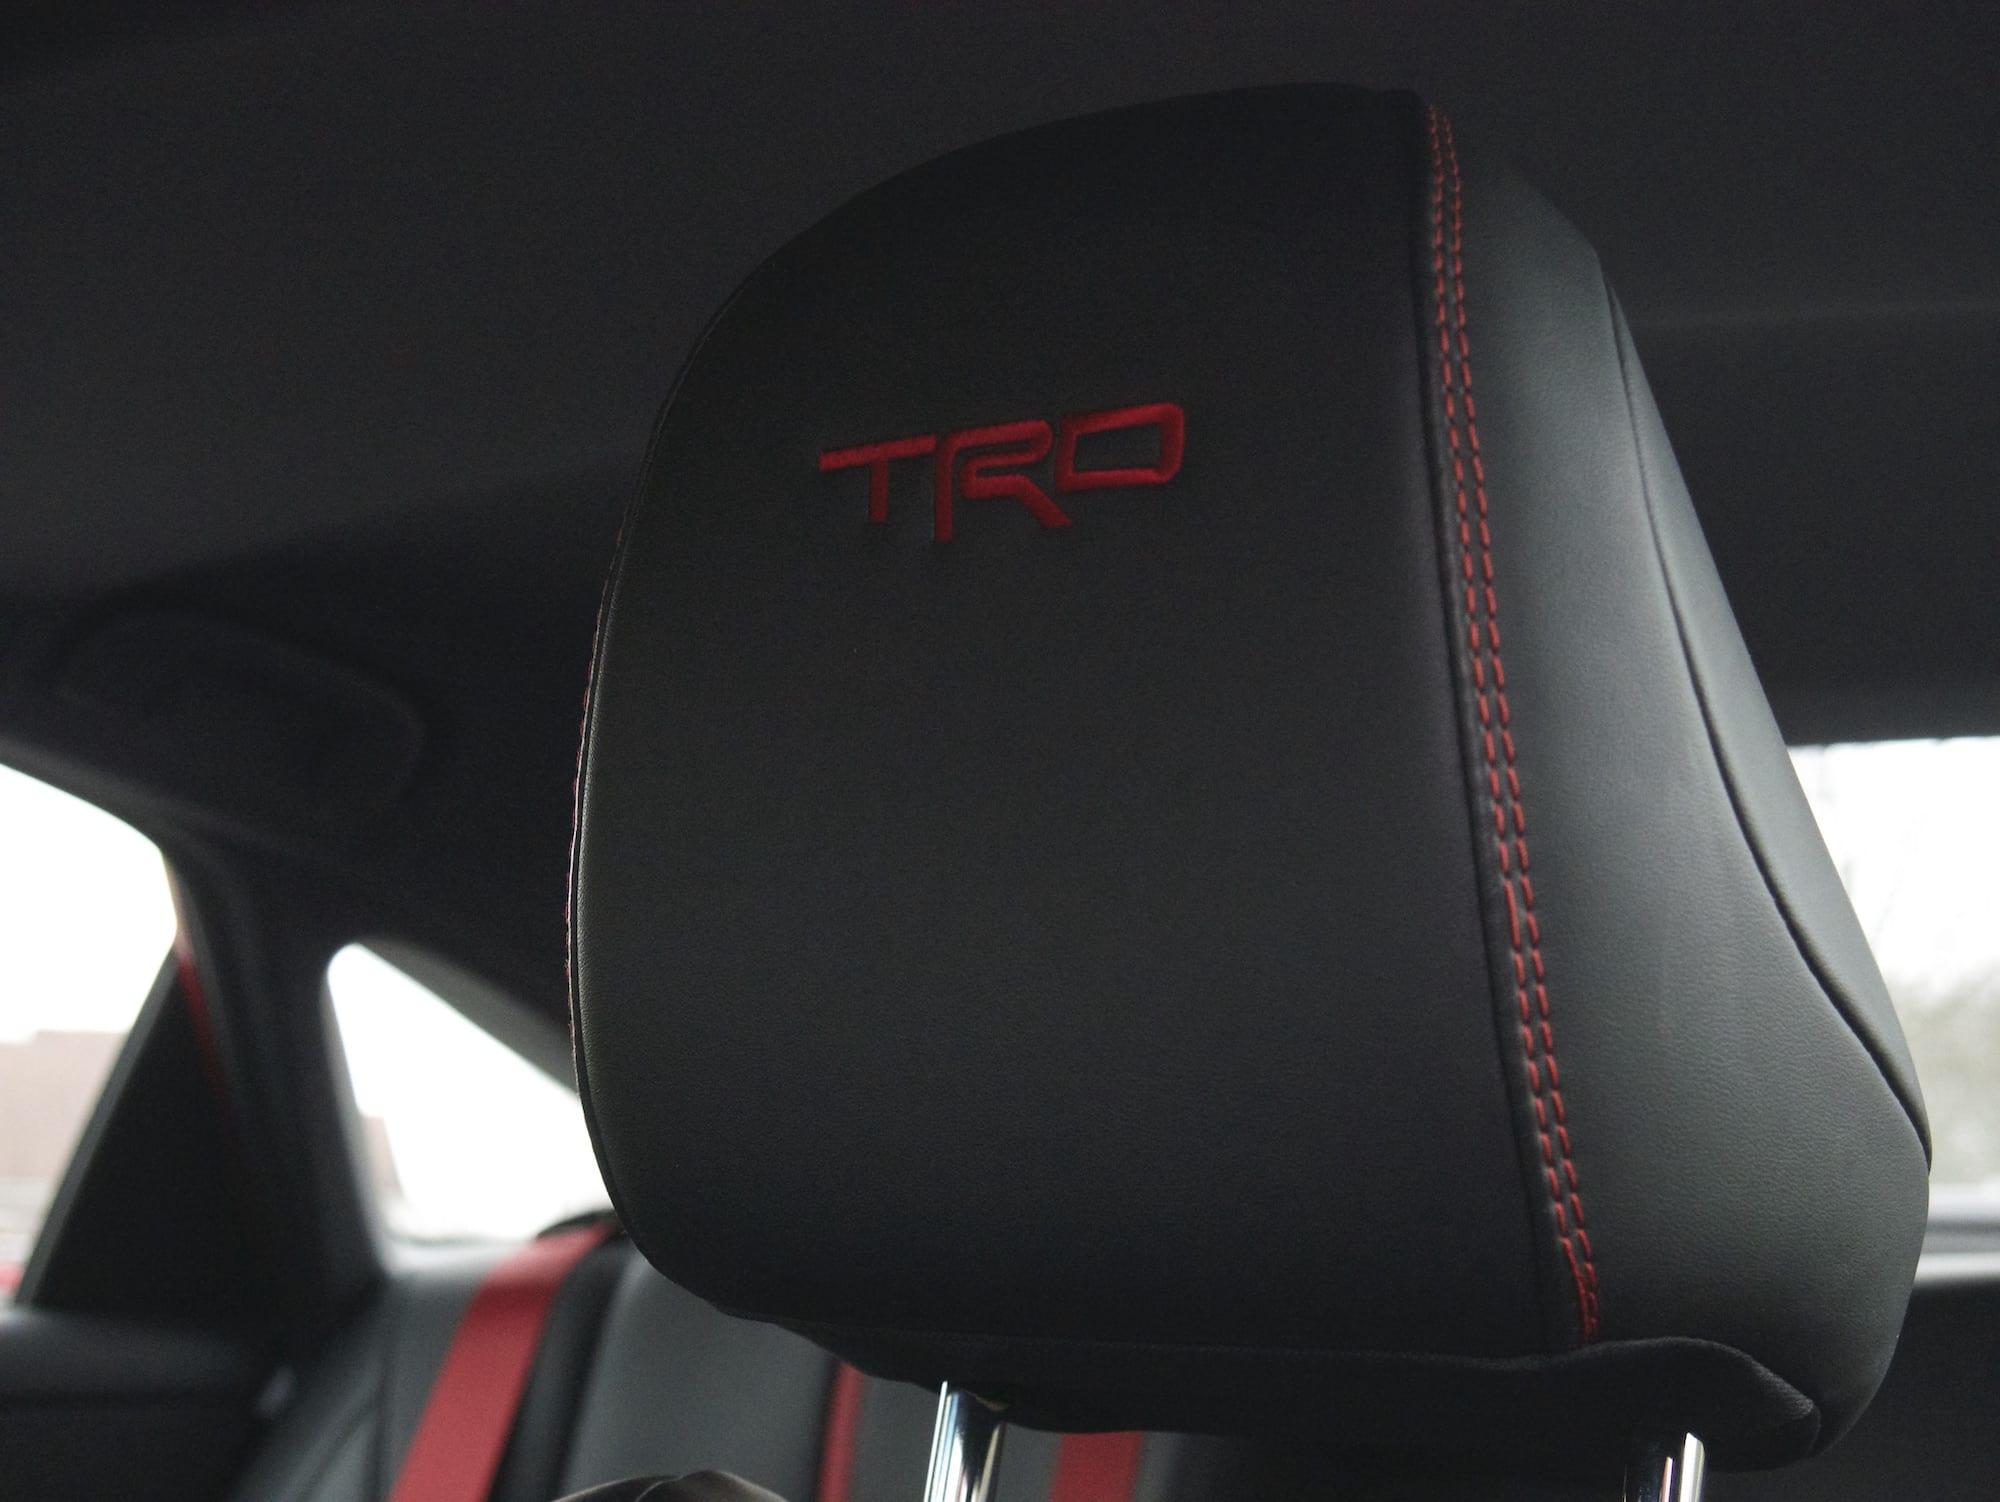 2020 toyota Avalon TRD headrest